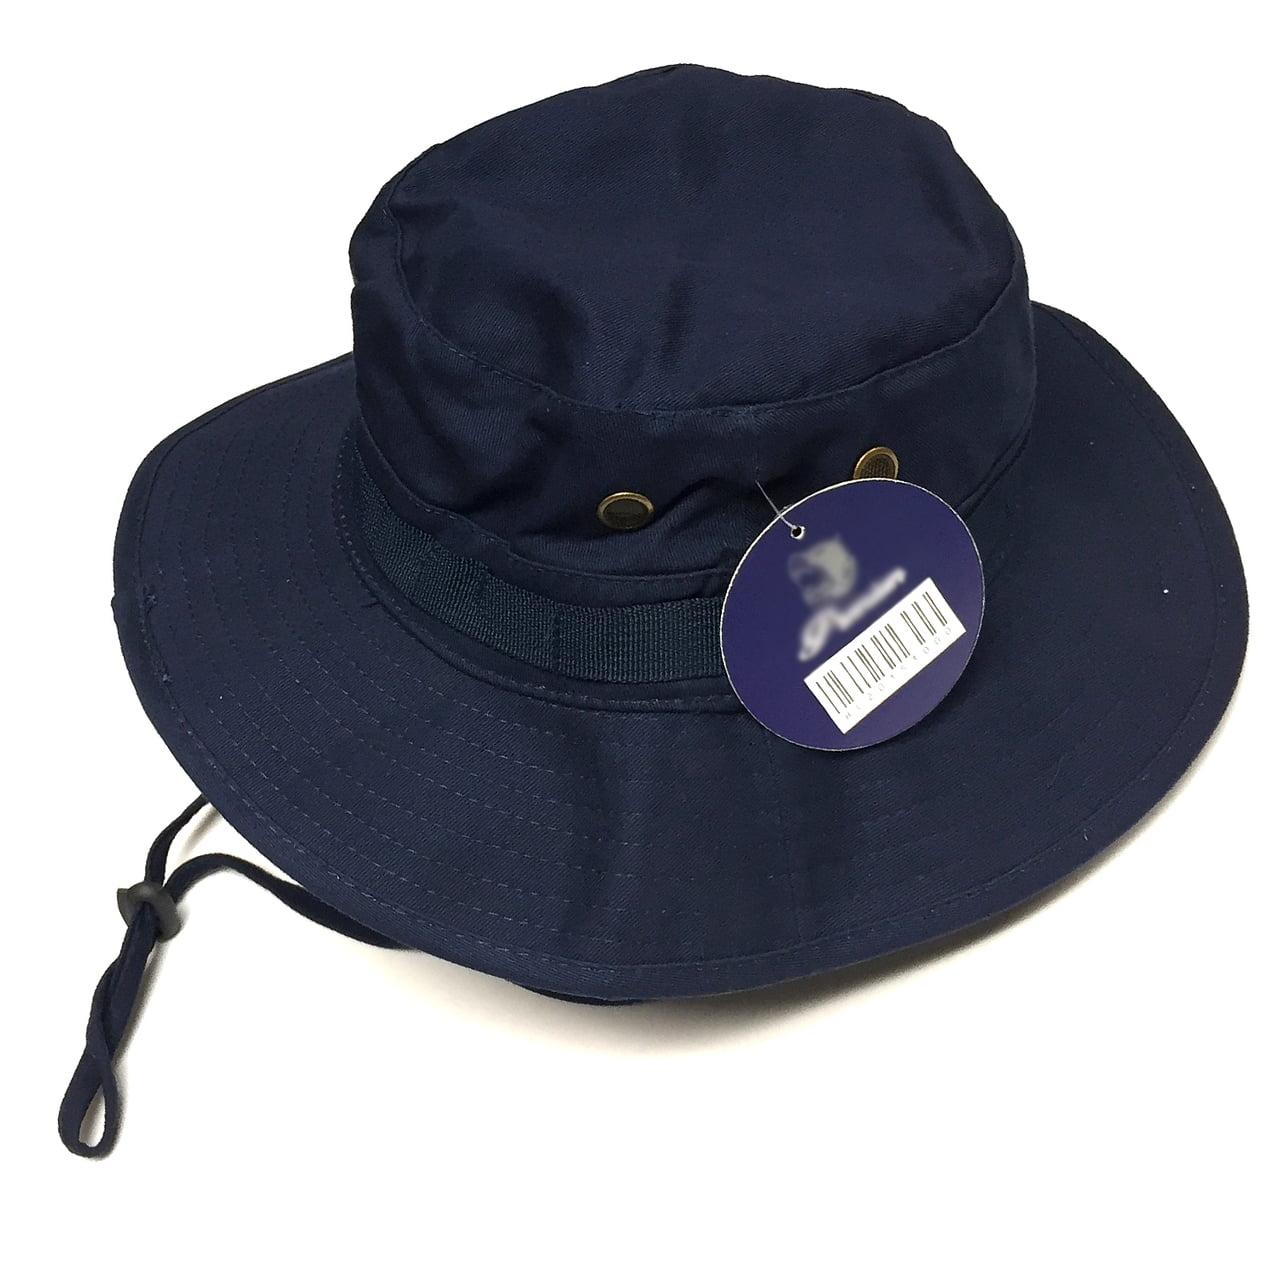 bec022226fd Pit Bull - Men  s Boonie Bucket Hat Wide Brim Outdoor Camping Fishing Cap  Navy Blue - Walmart.com